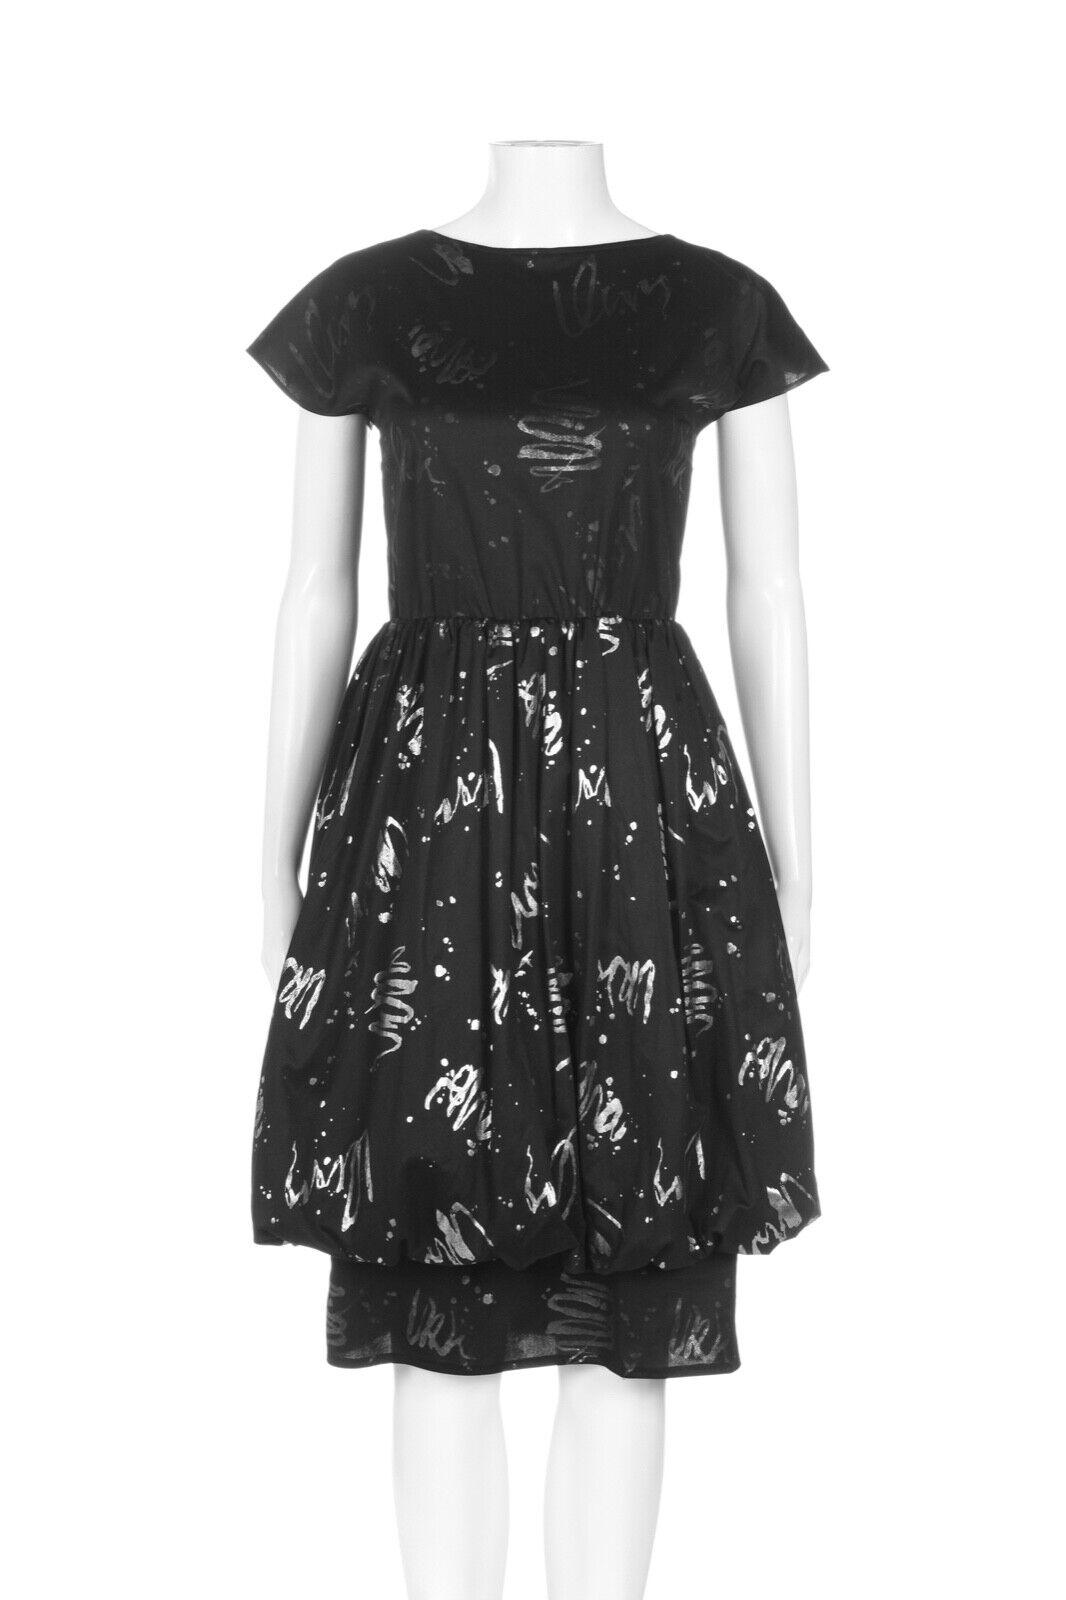 HANDMADE Balloon Dress Small Black Silver High Ne… - image 1